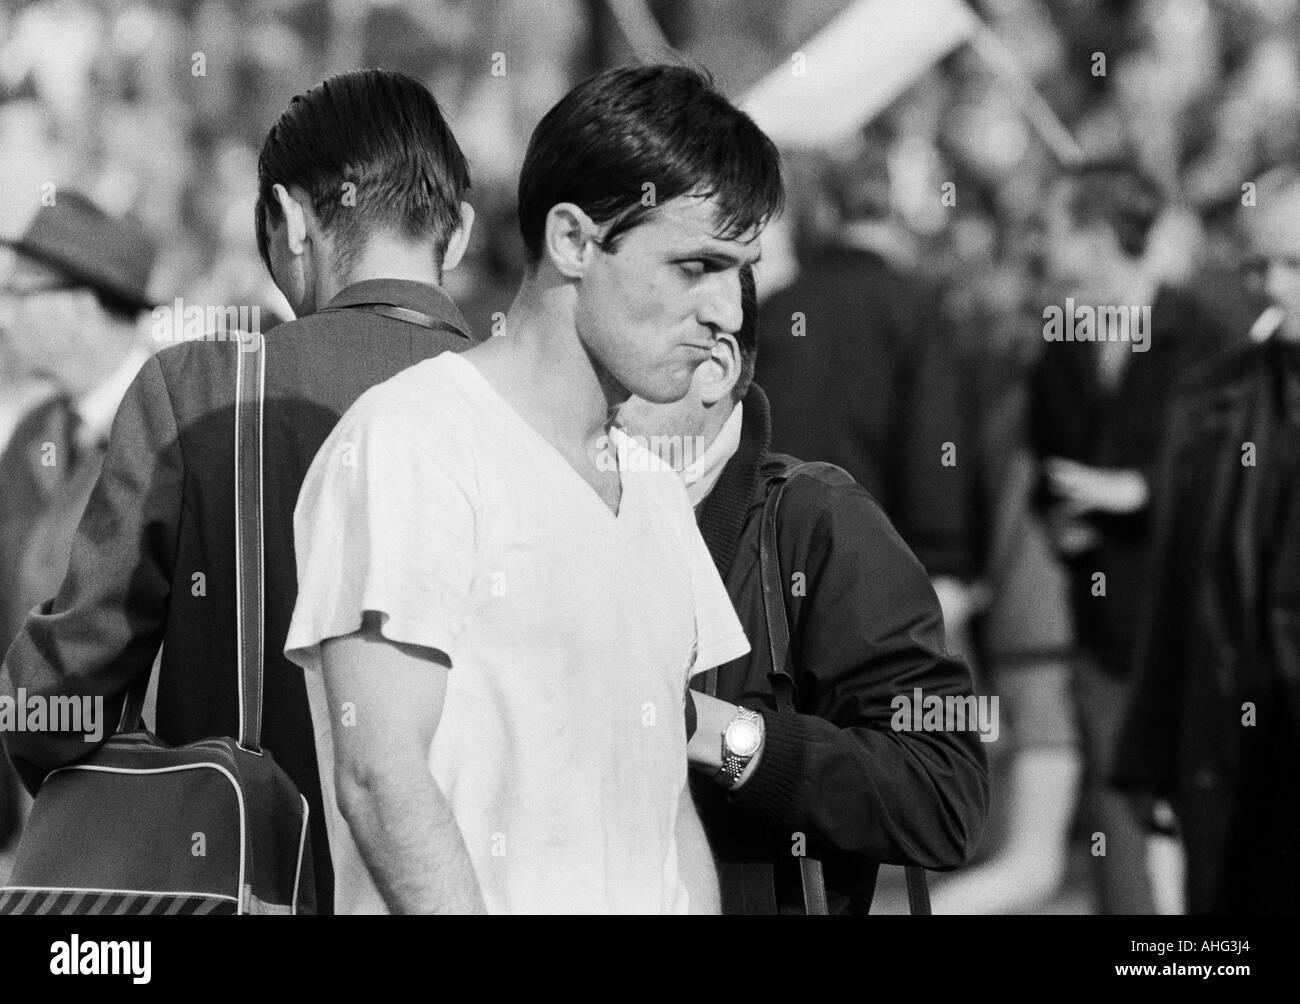 football, Bundesliga, 1966/1967, Stadium at the Hamburger Strasse, Eintracht Brunswick versus Borussia Moenchengladbach 2:1, football player, portrait Vladimir Durkovic (Gladbach) - Stock Image